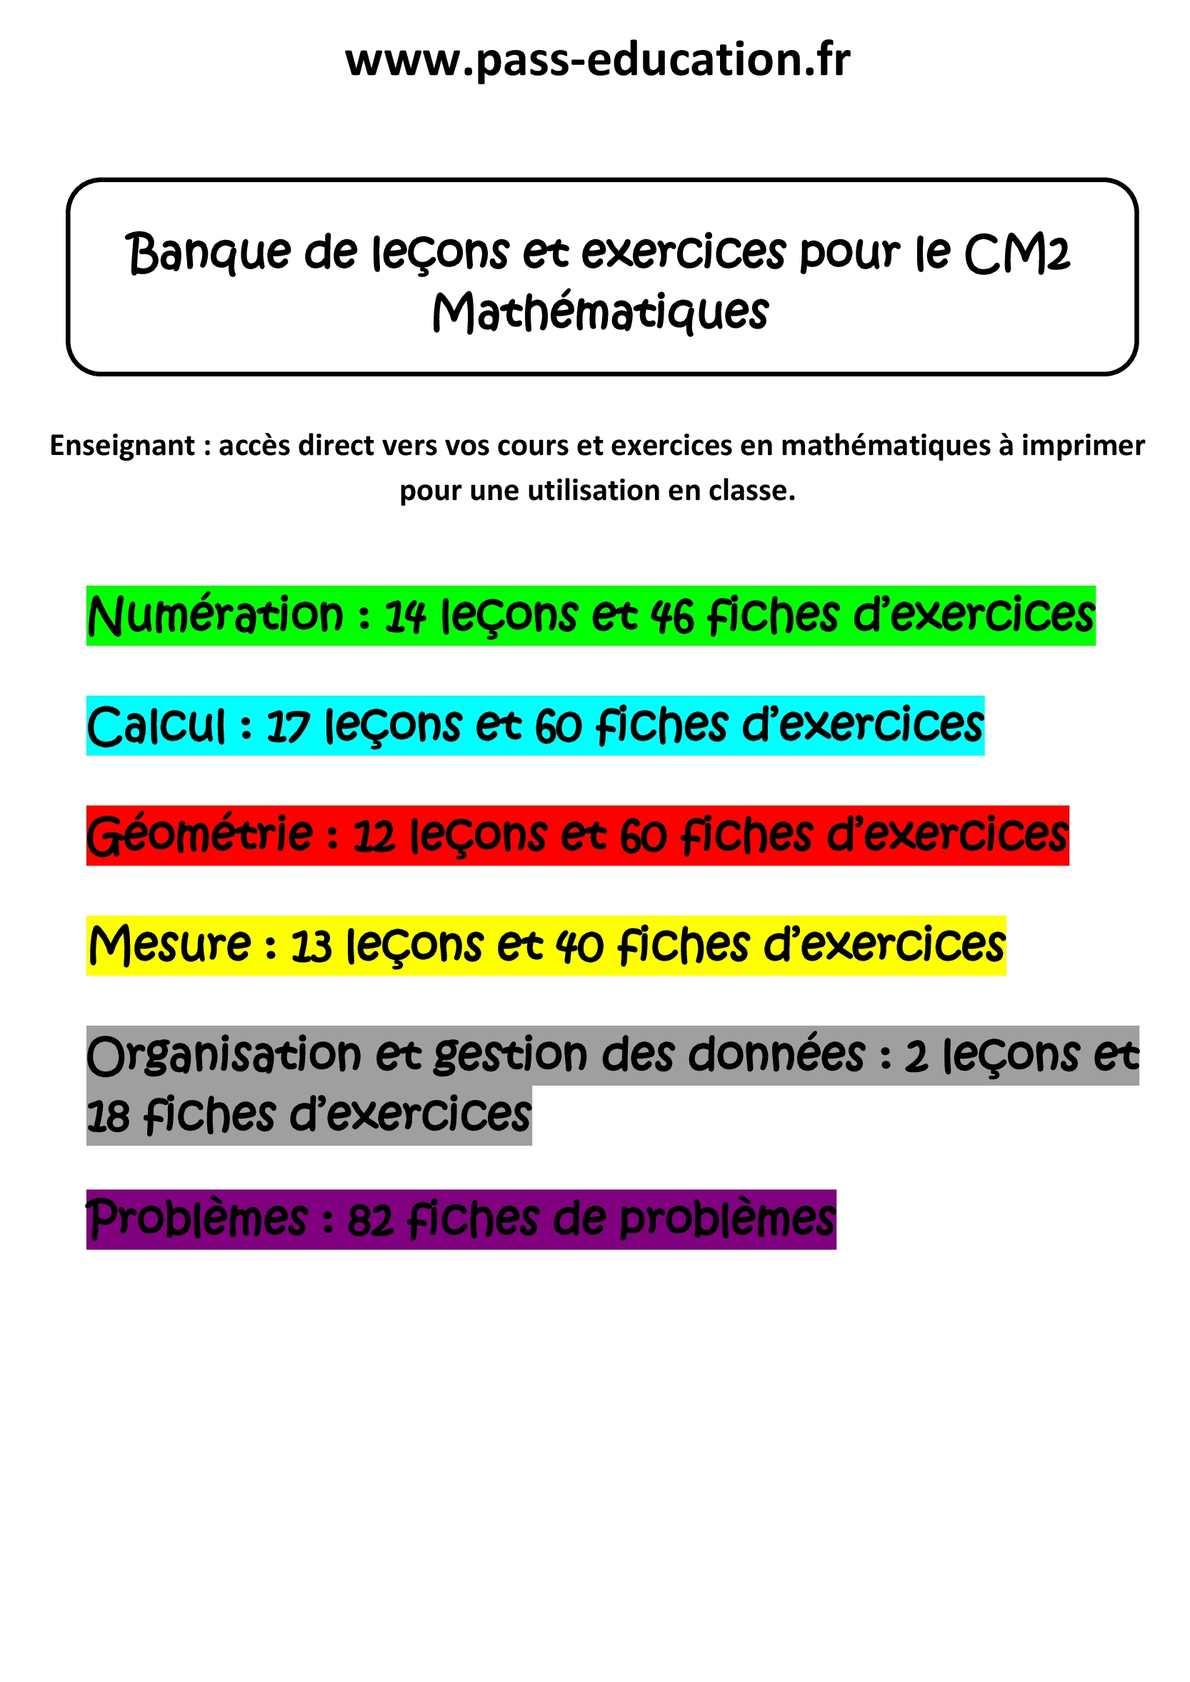 Calam o cm2 math matiques banque de le ons et exercices - Calcul cm1 a imprimer ...